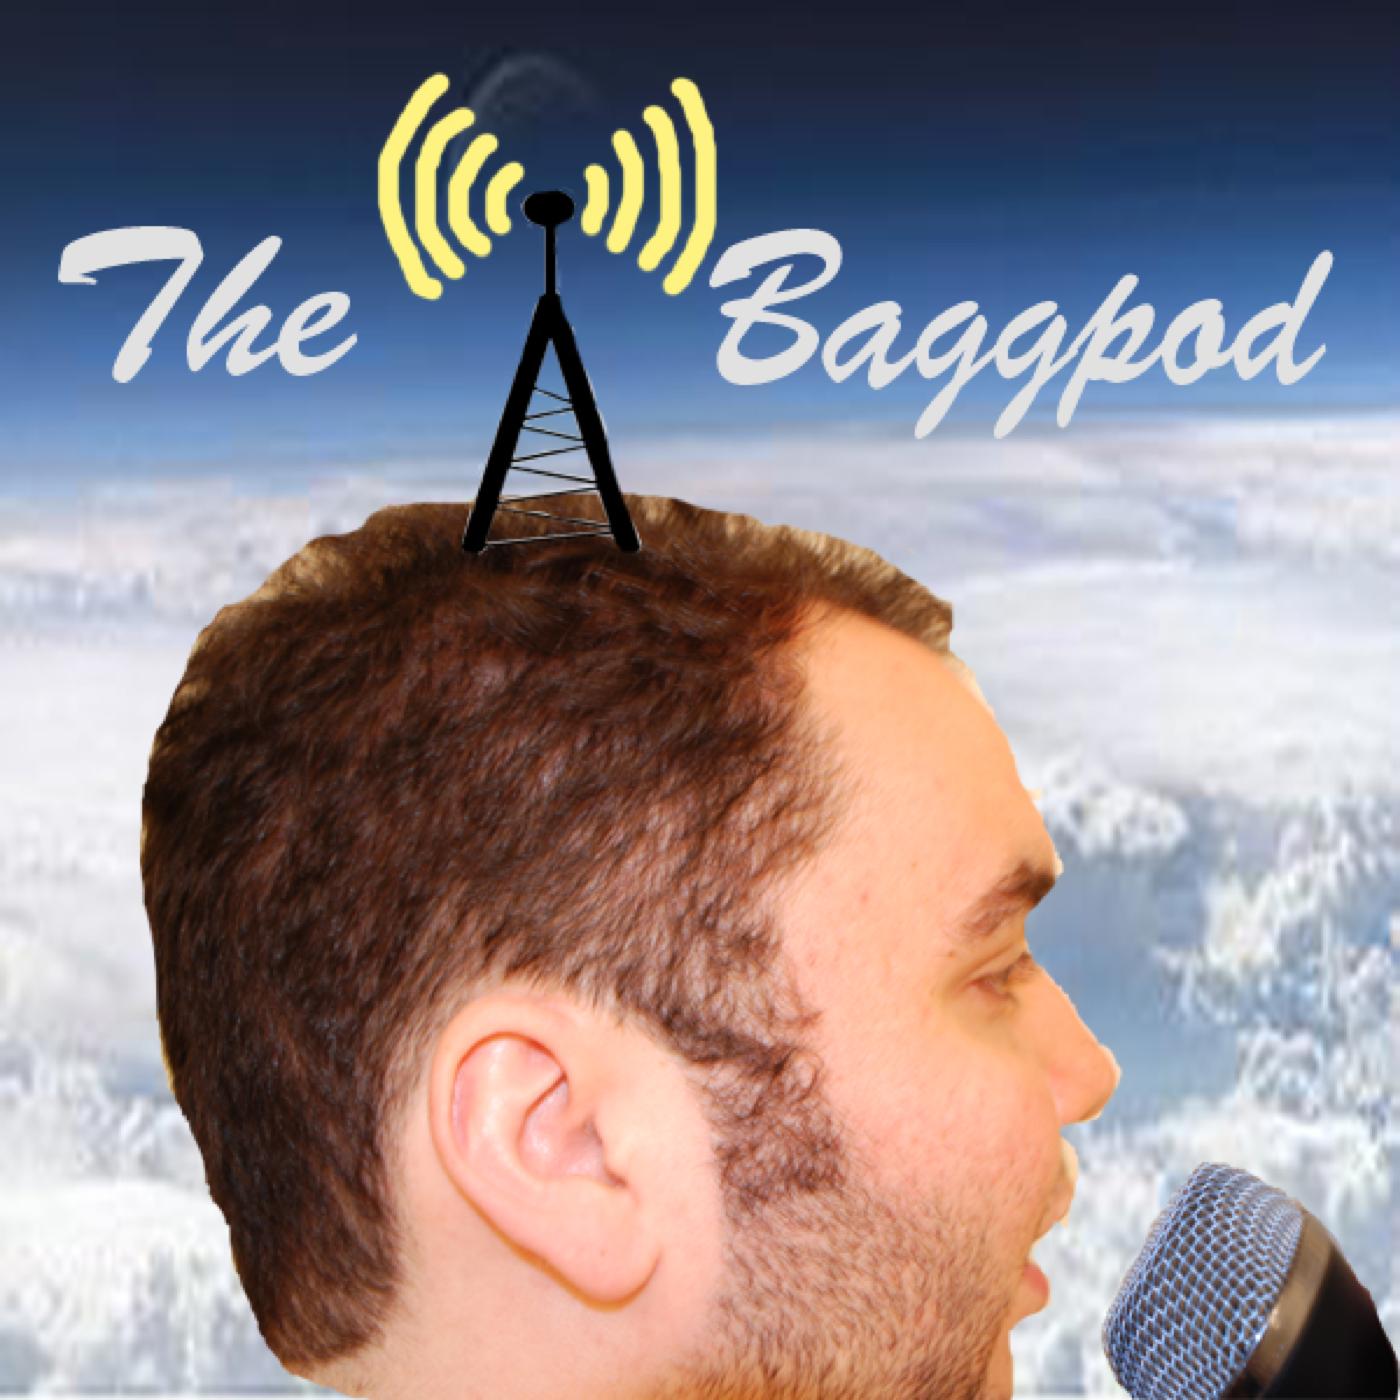 Baggpod-1400